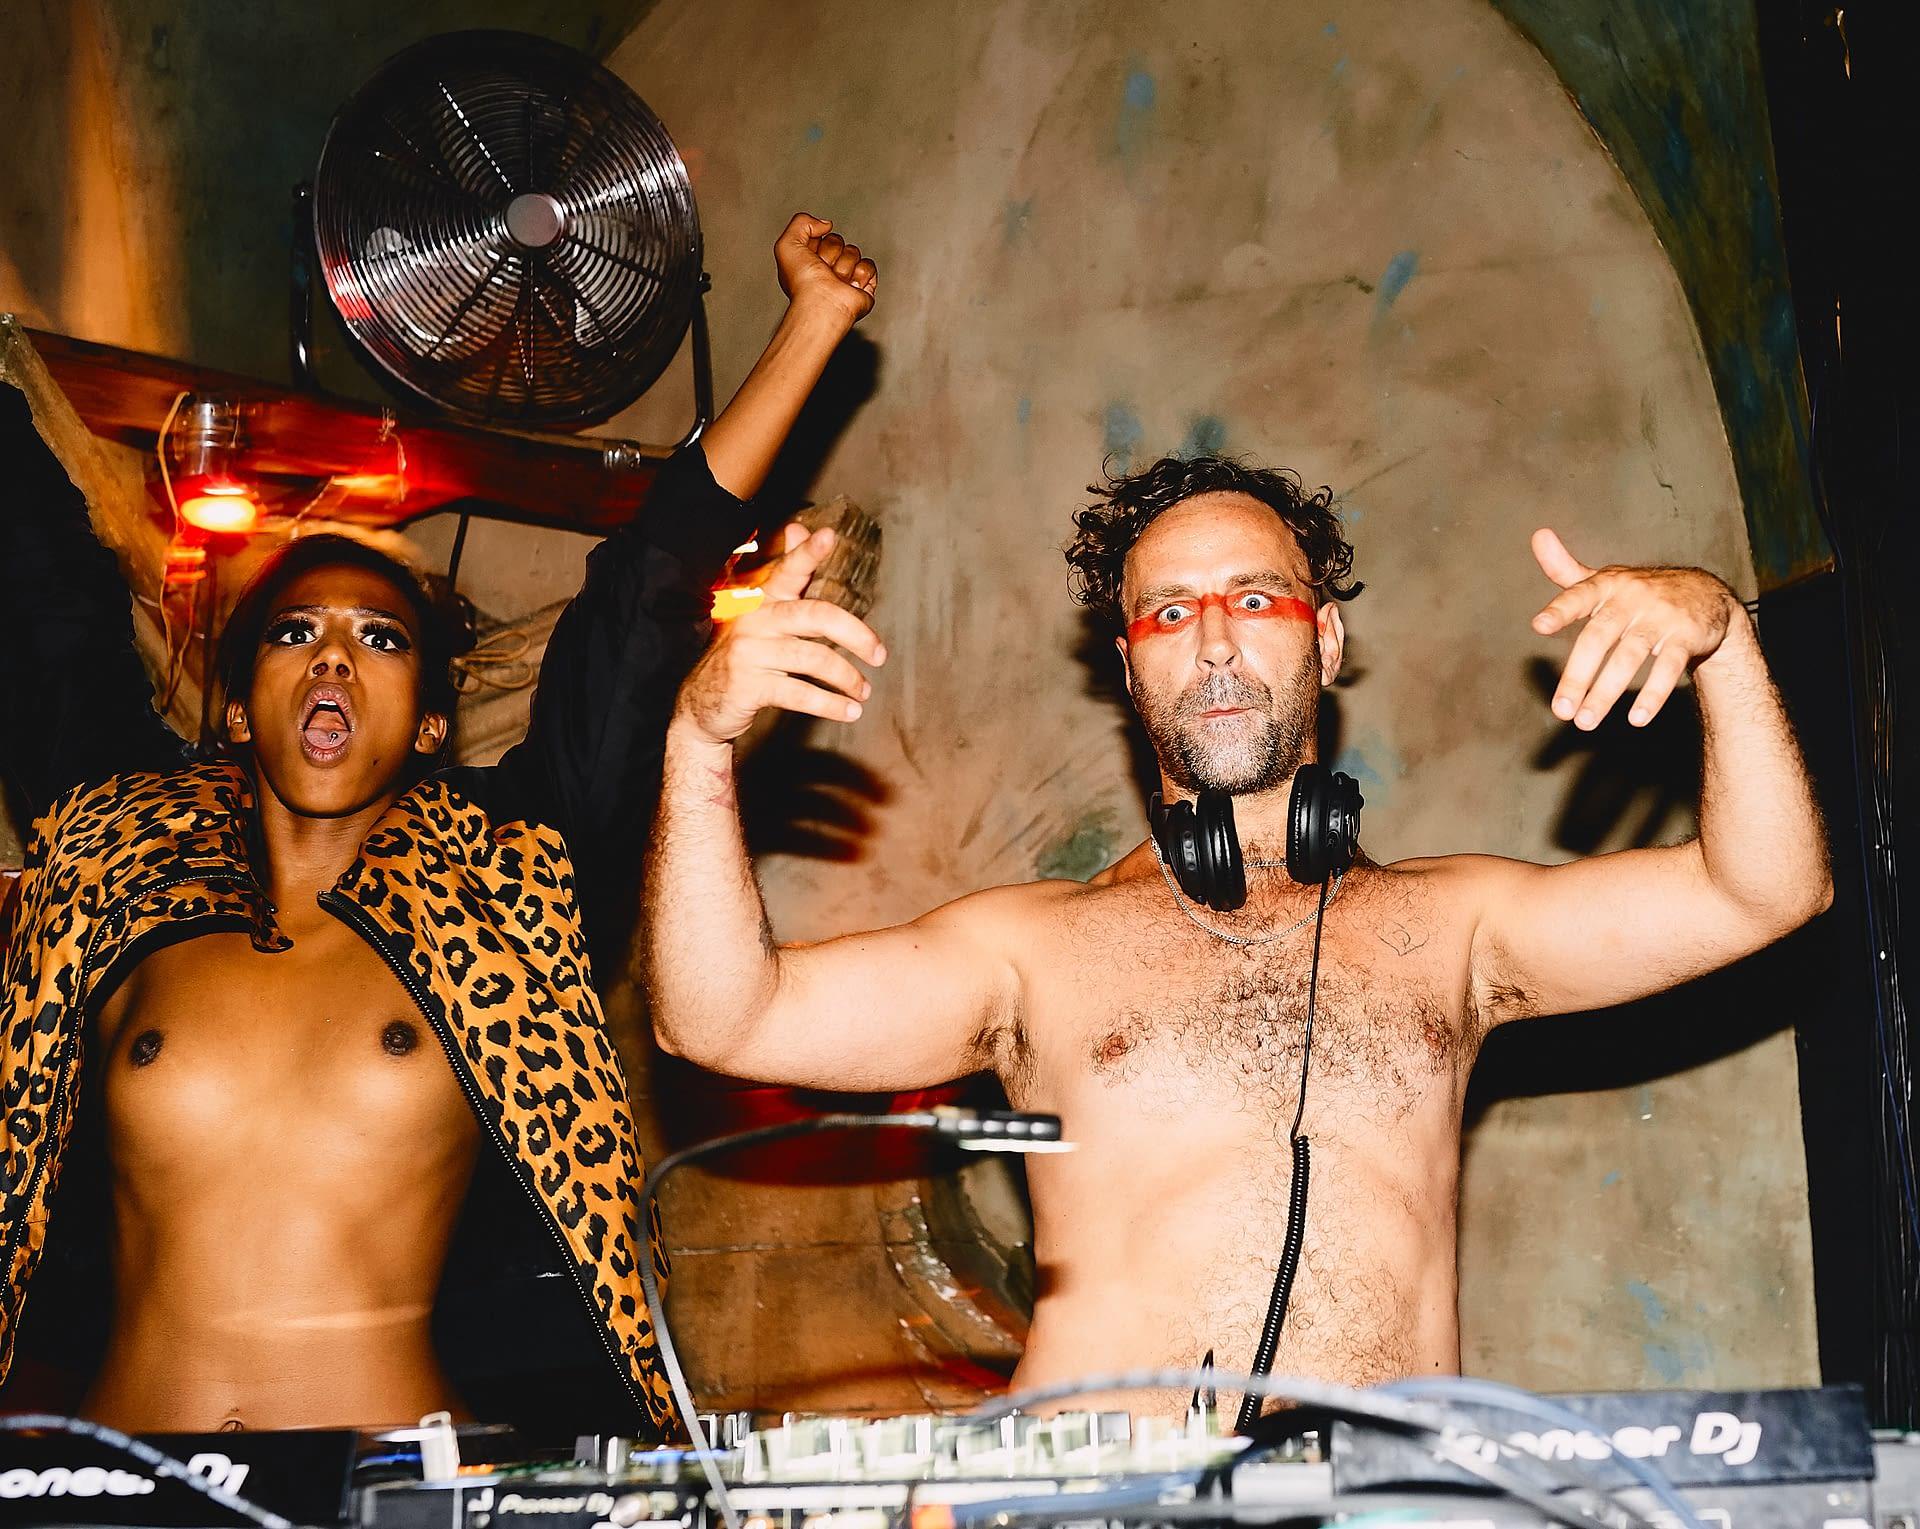 DJ Jan Ehret Four Play im KitKat Club Berlin 1